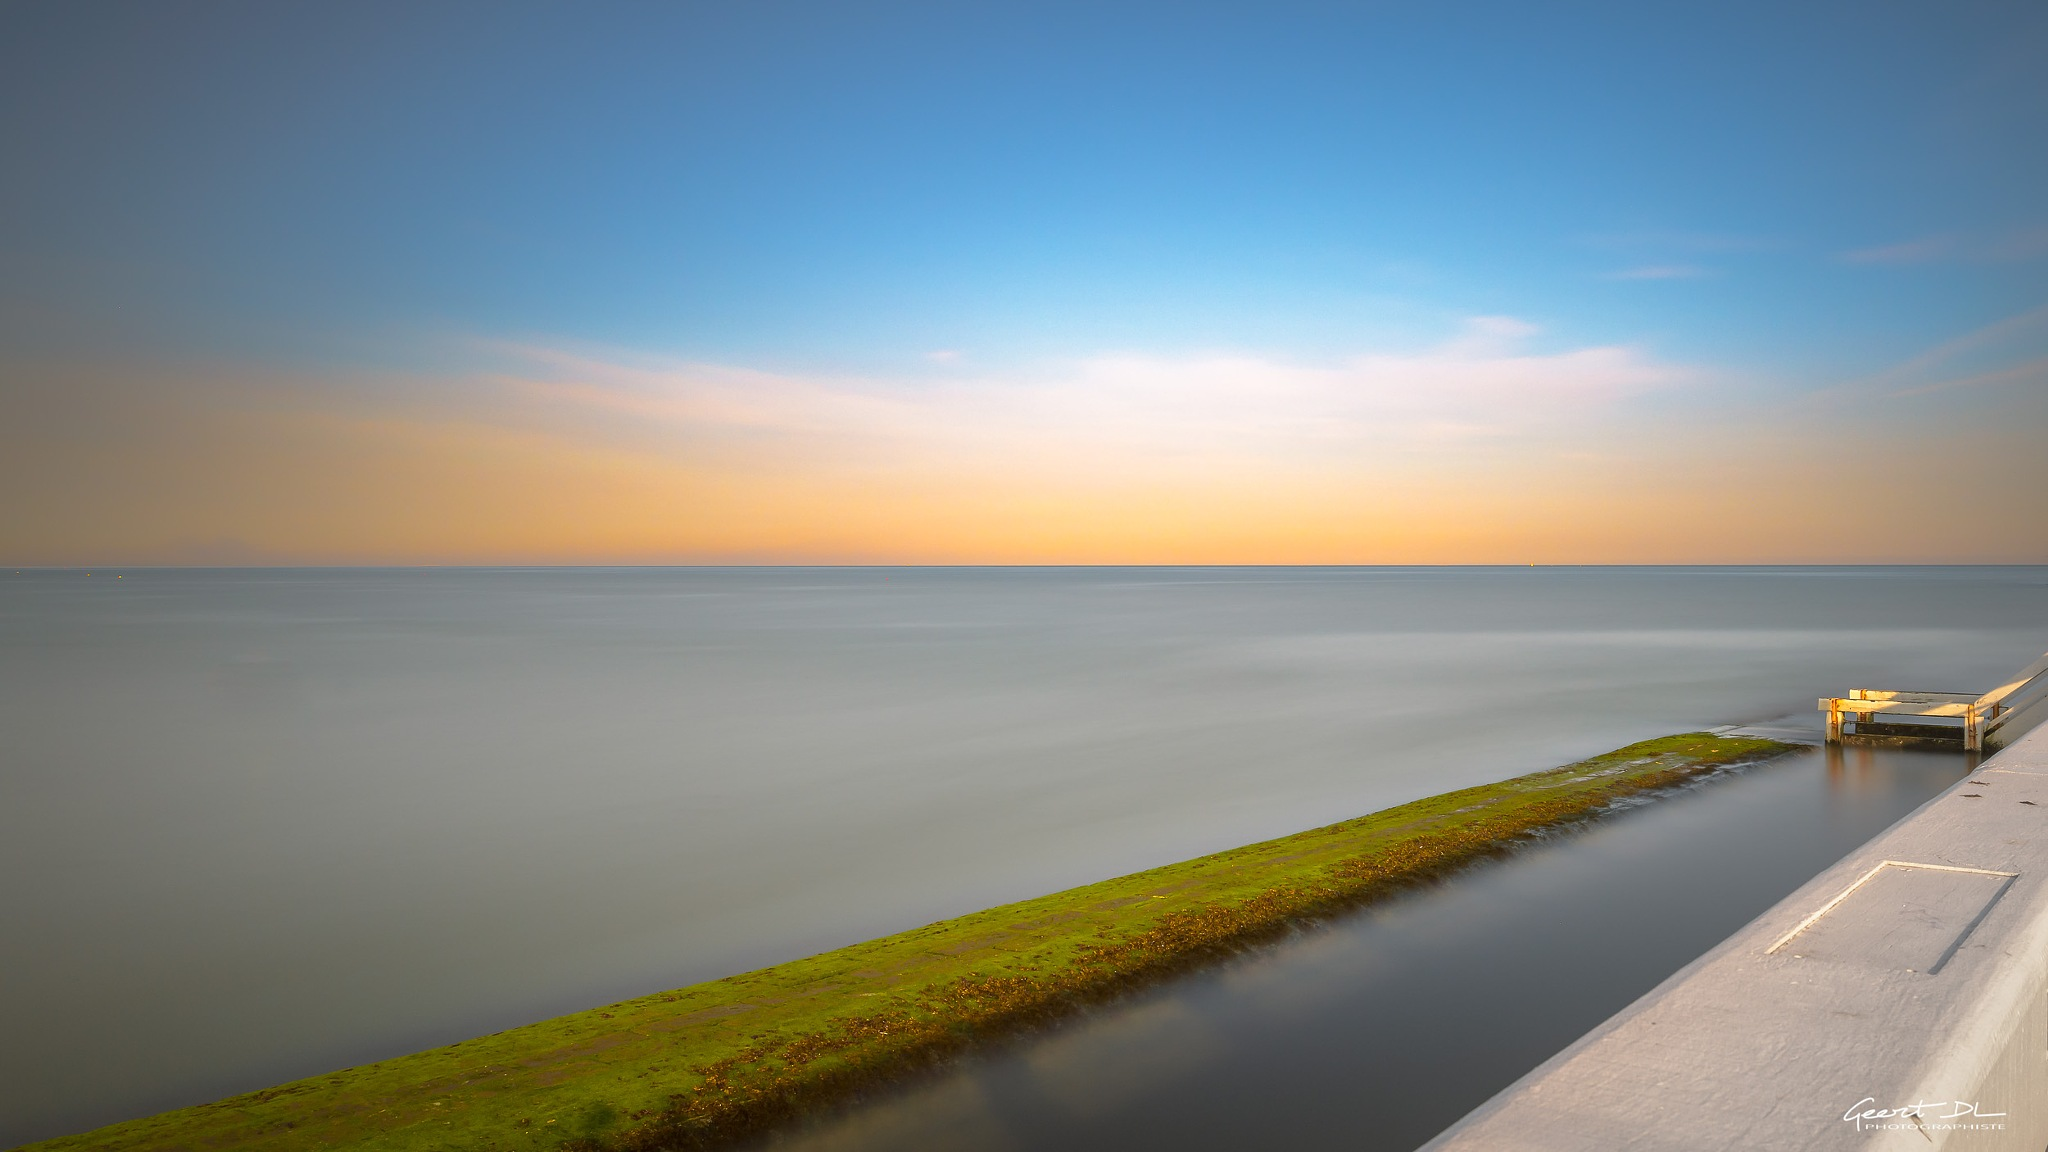 Golden horizon at Nieuwpoort by GeertDoutreligne